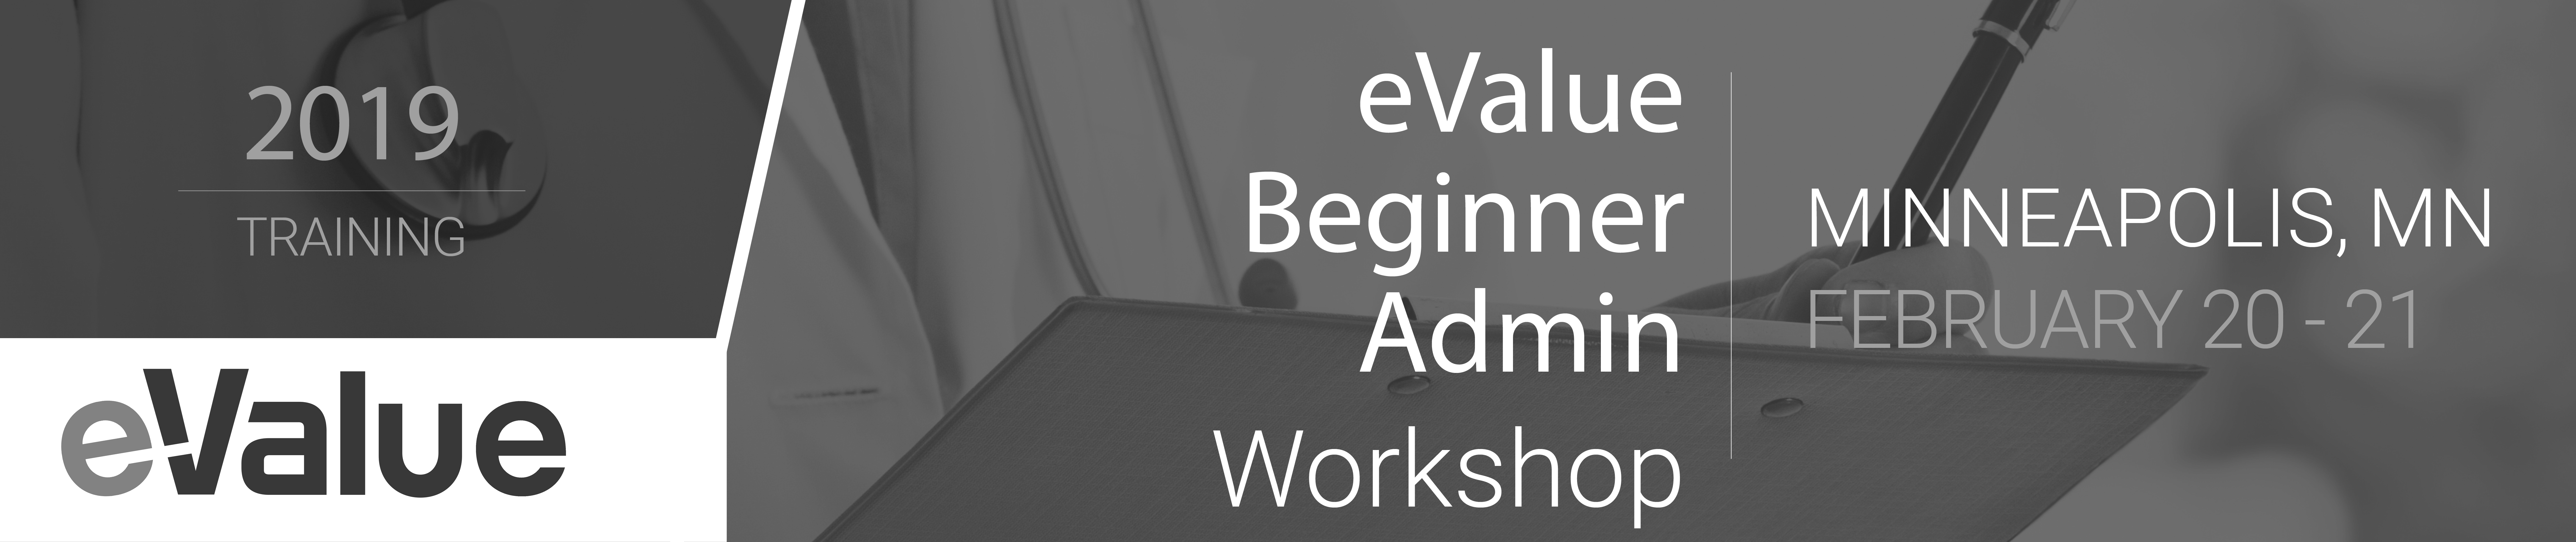 eValue Beginner Administrator Workshop (February 20-21)